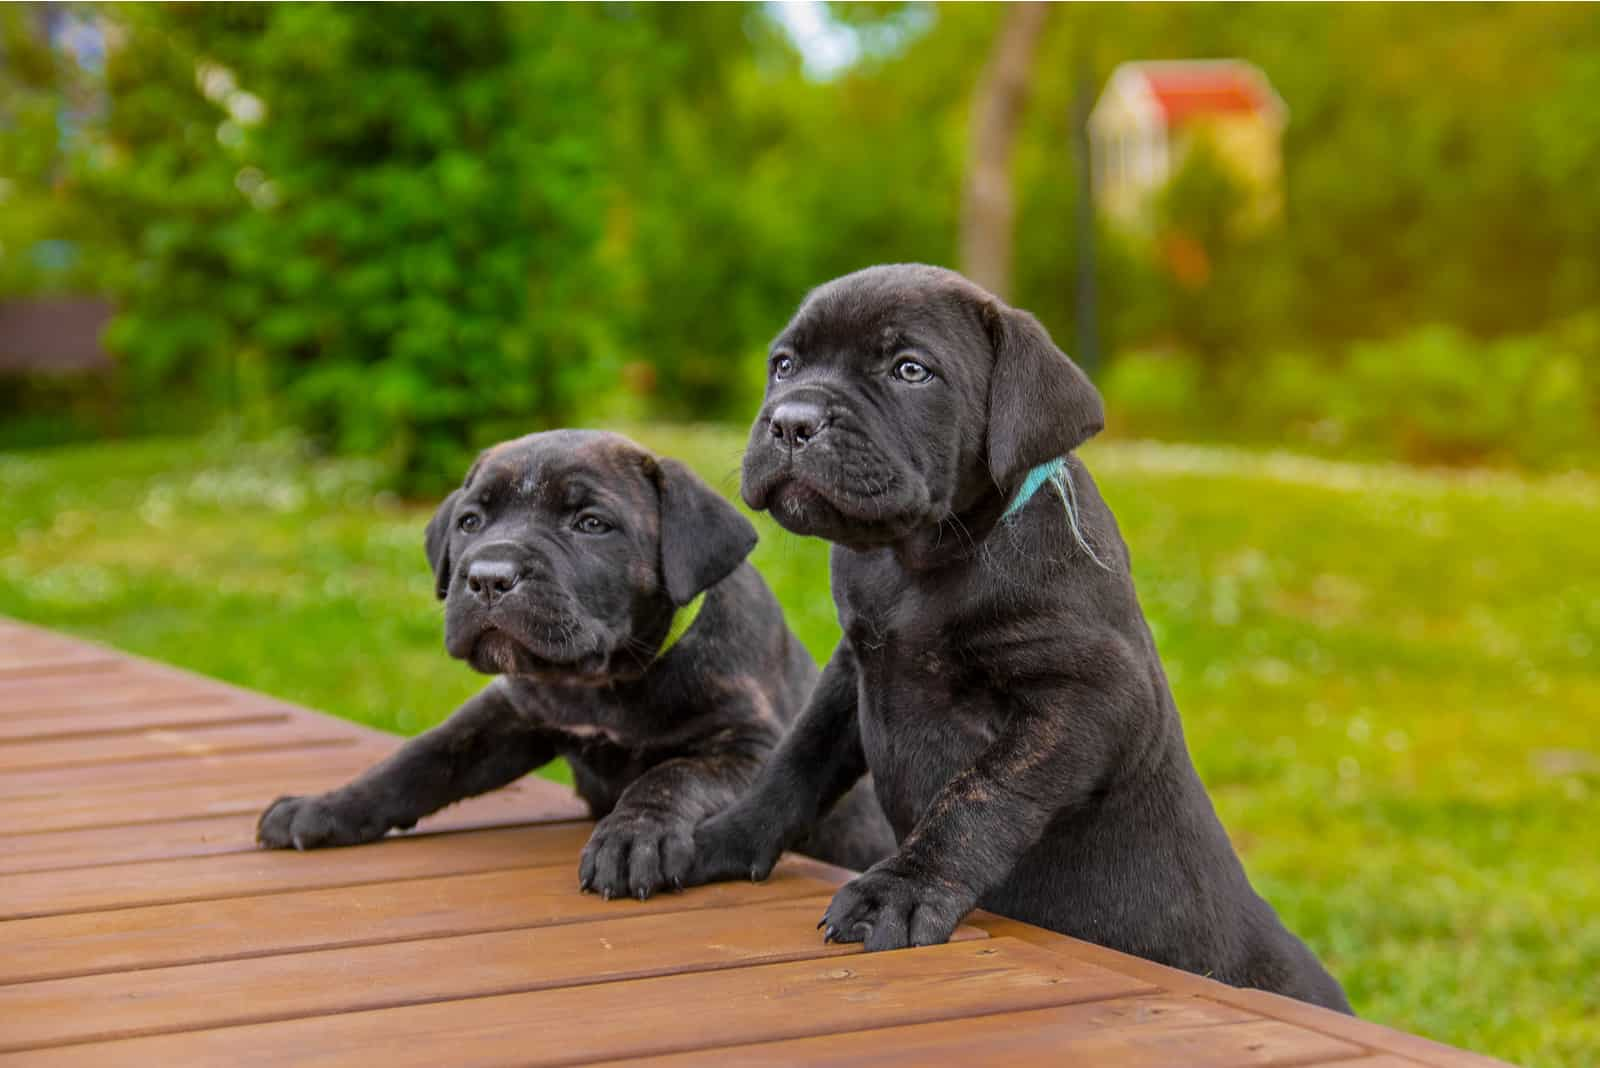 Two adorable Cane Corso Italiano puppies